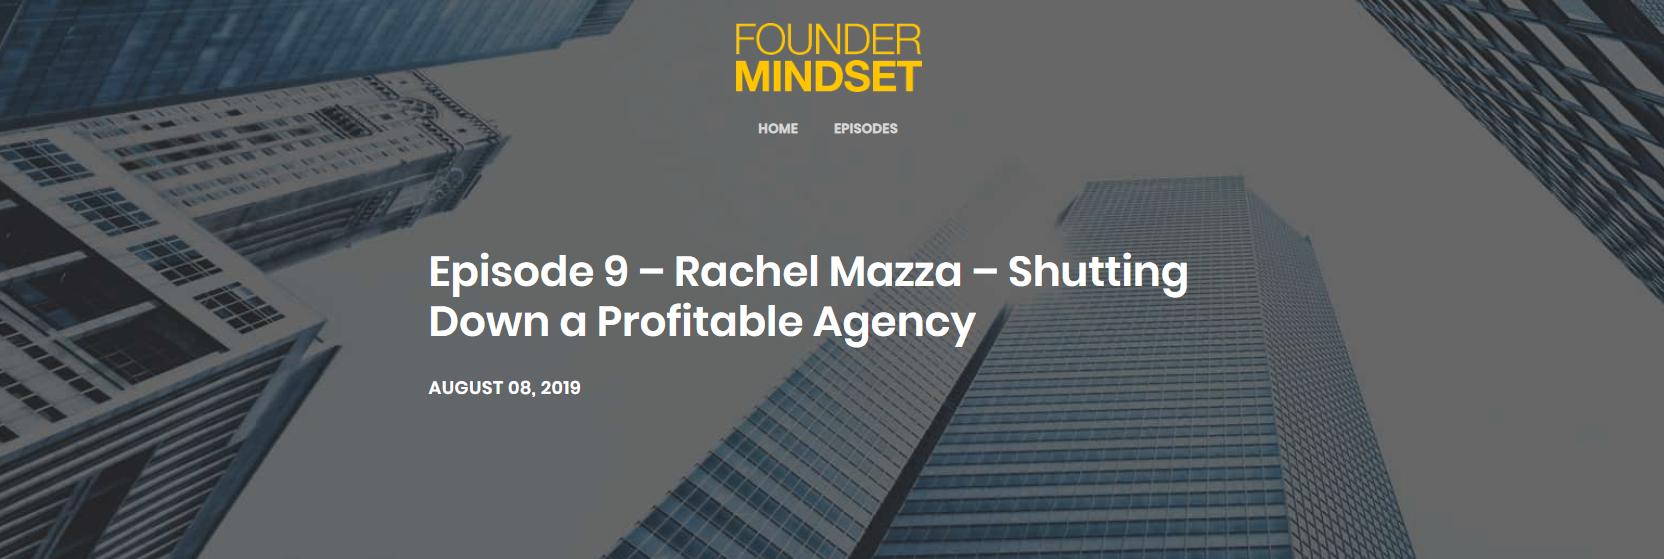 Why I shut down my profitable agency